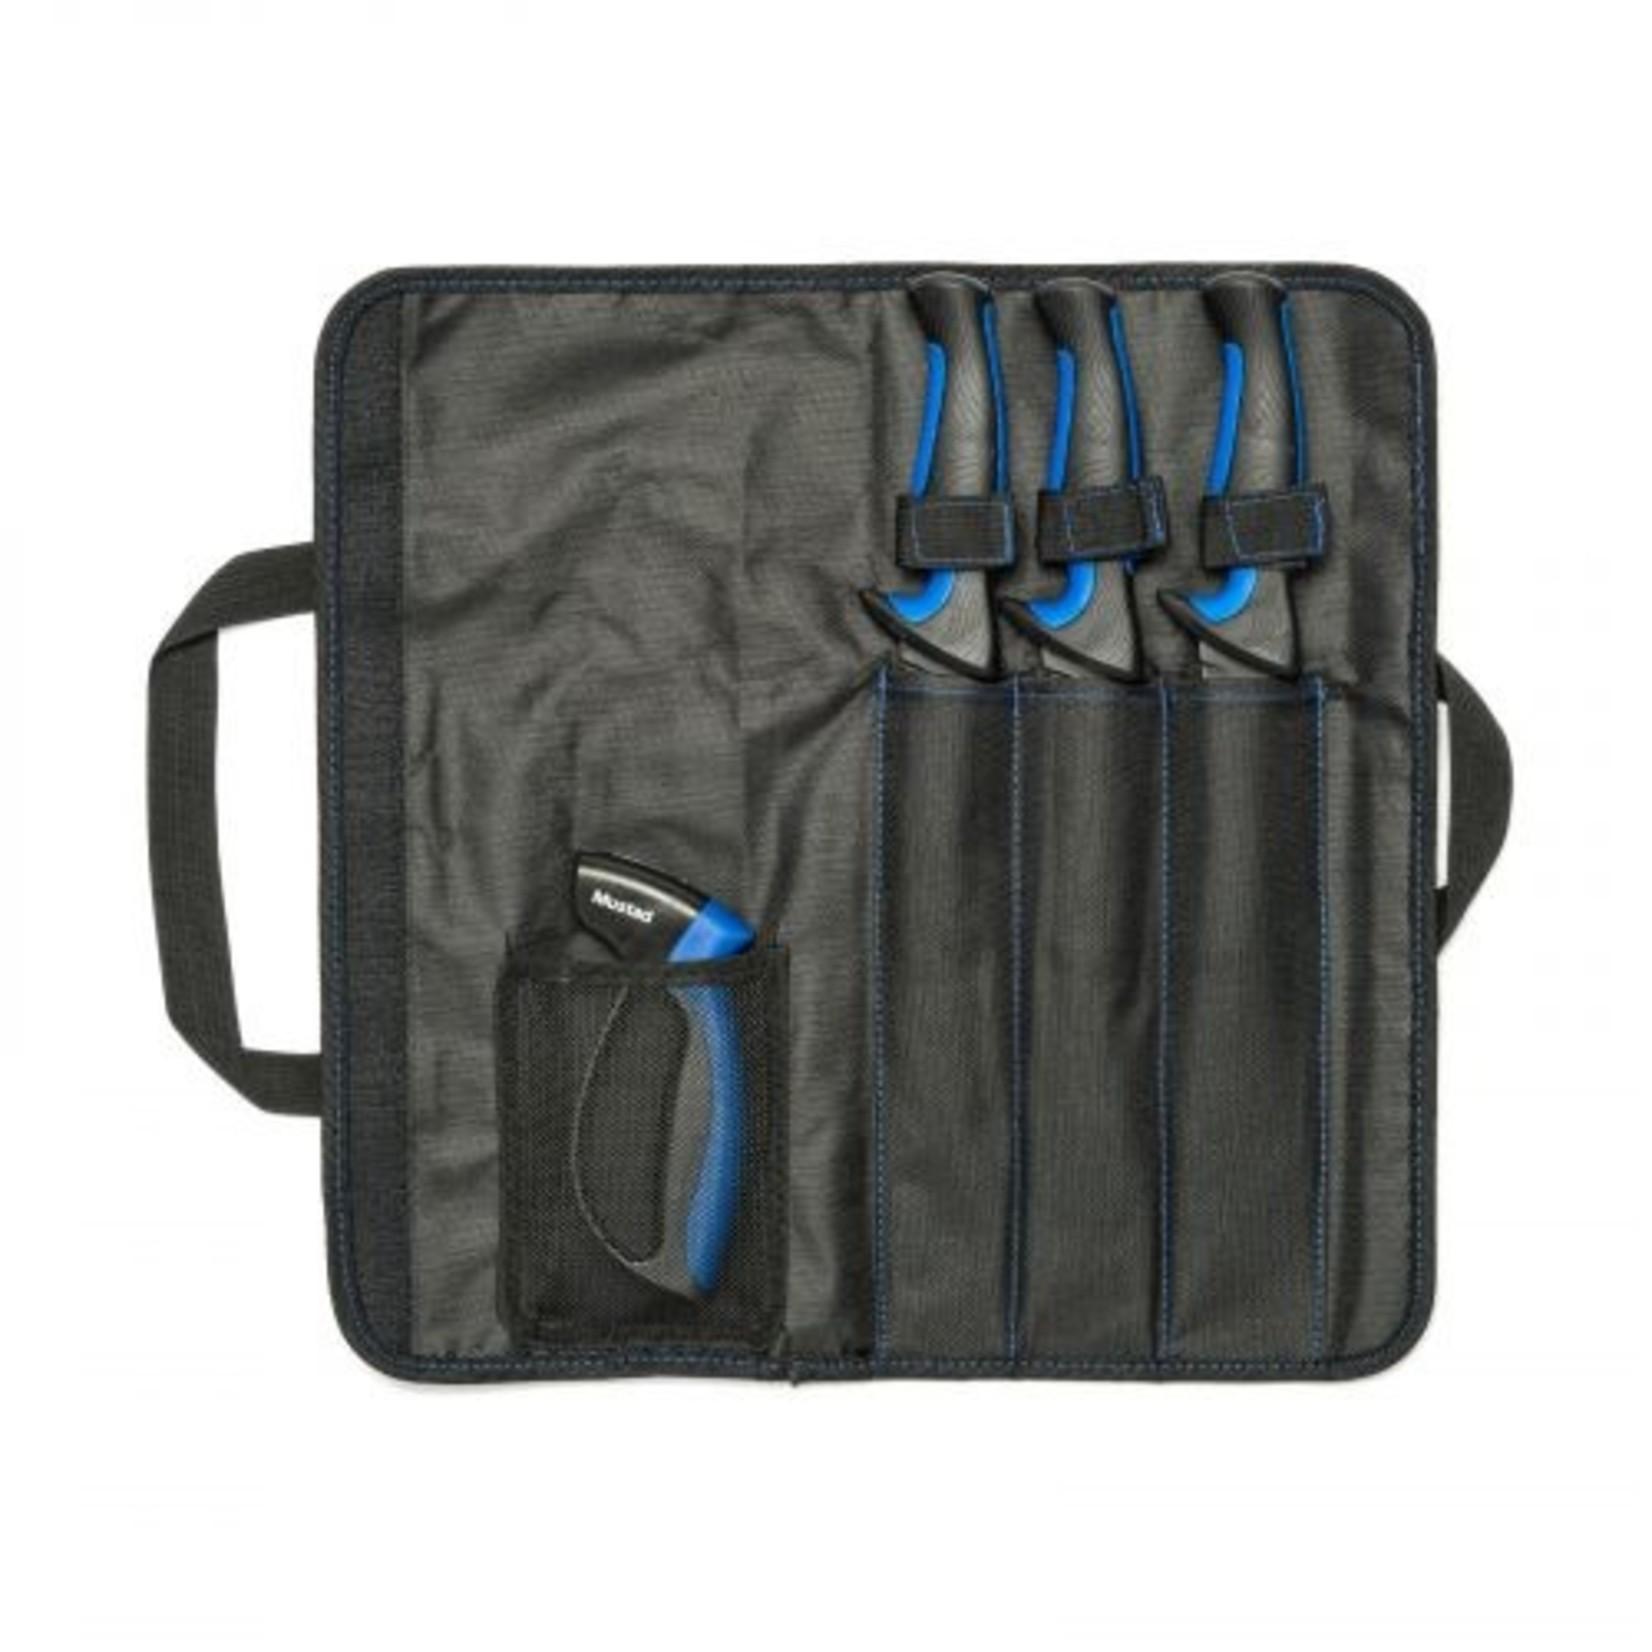 Mustad Mustad MT096 3-Piece Knife Kit With Sharpener